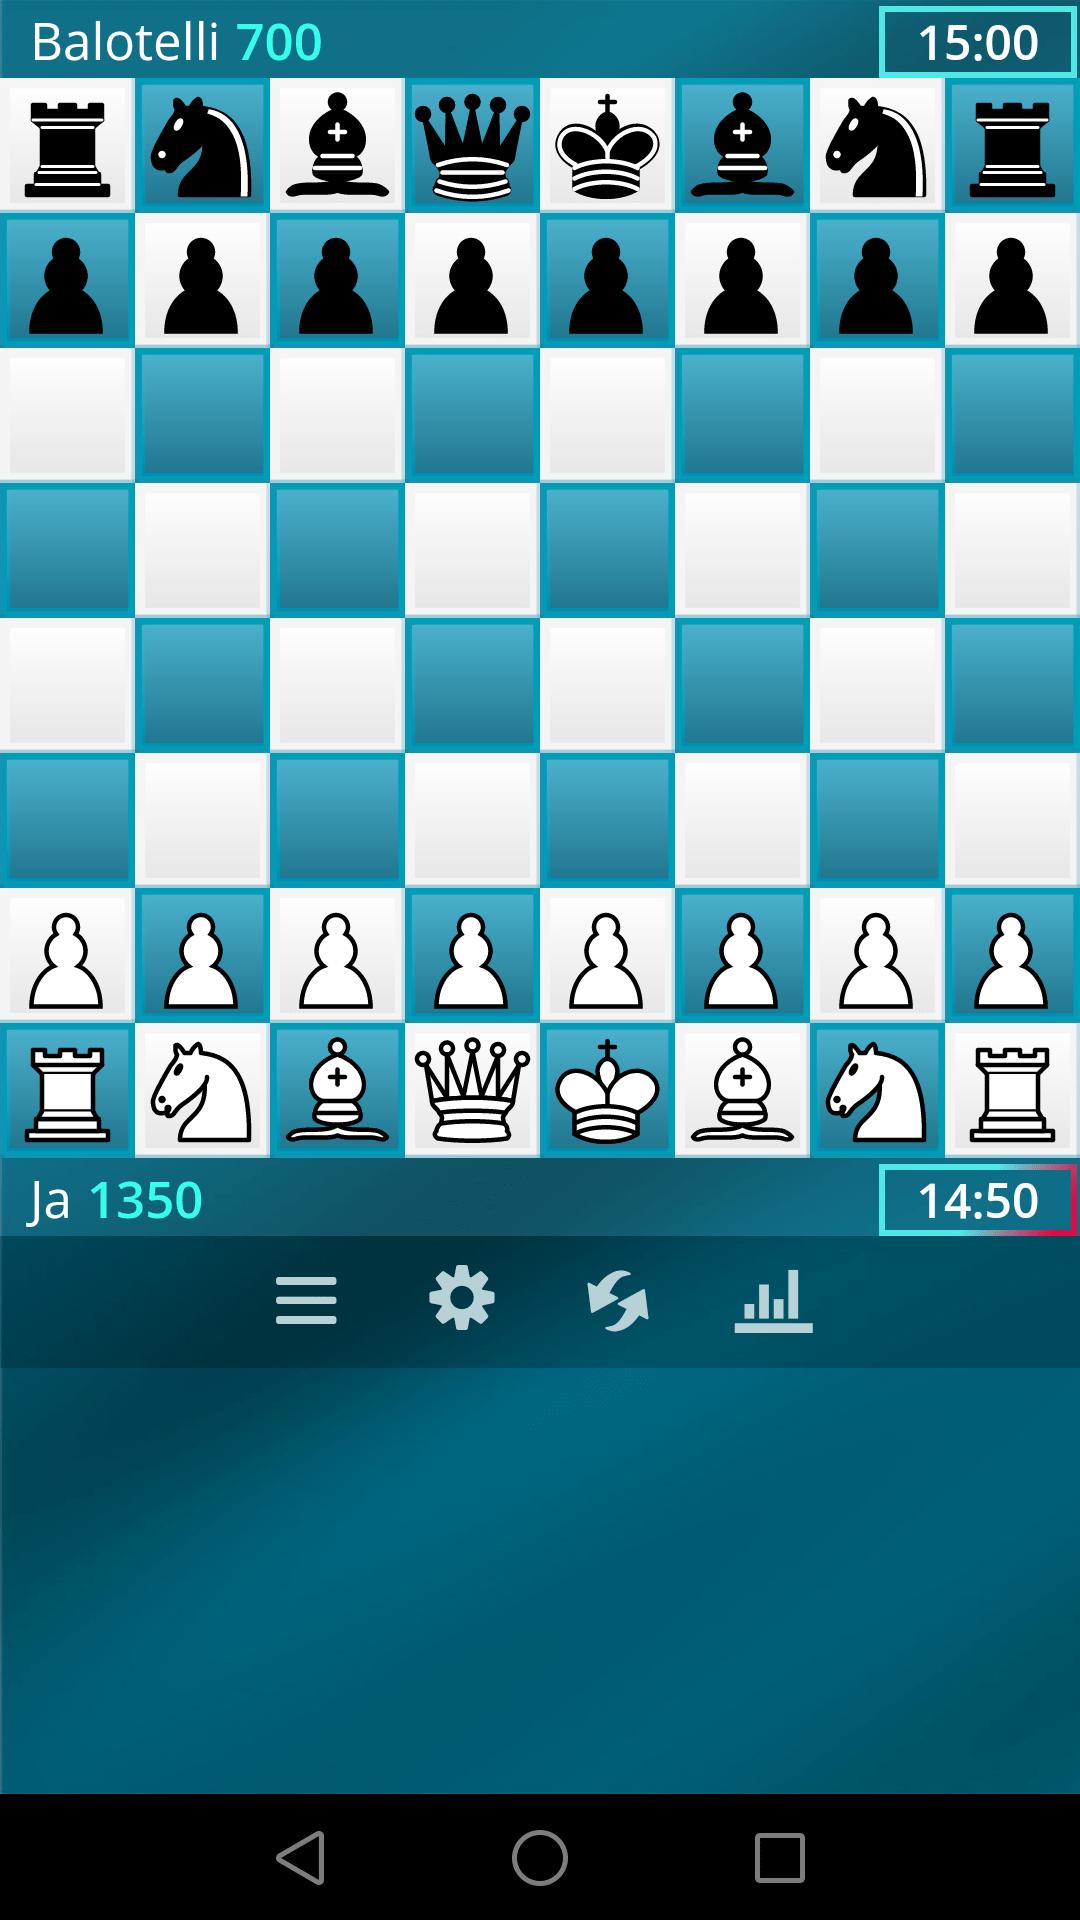 szachy na telefon z komputerem aplikacja